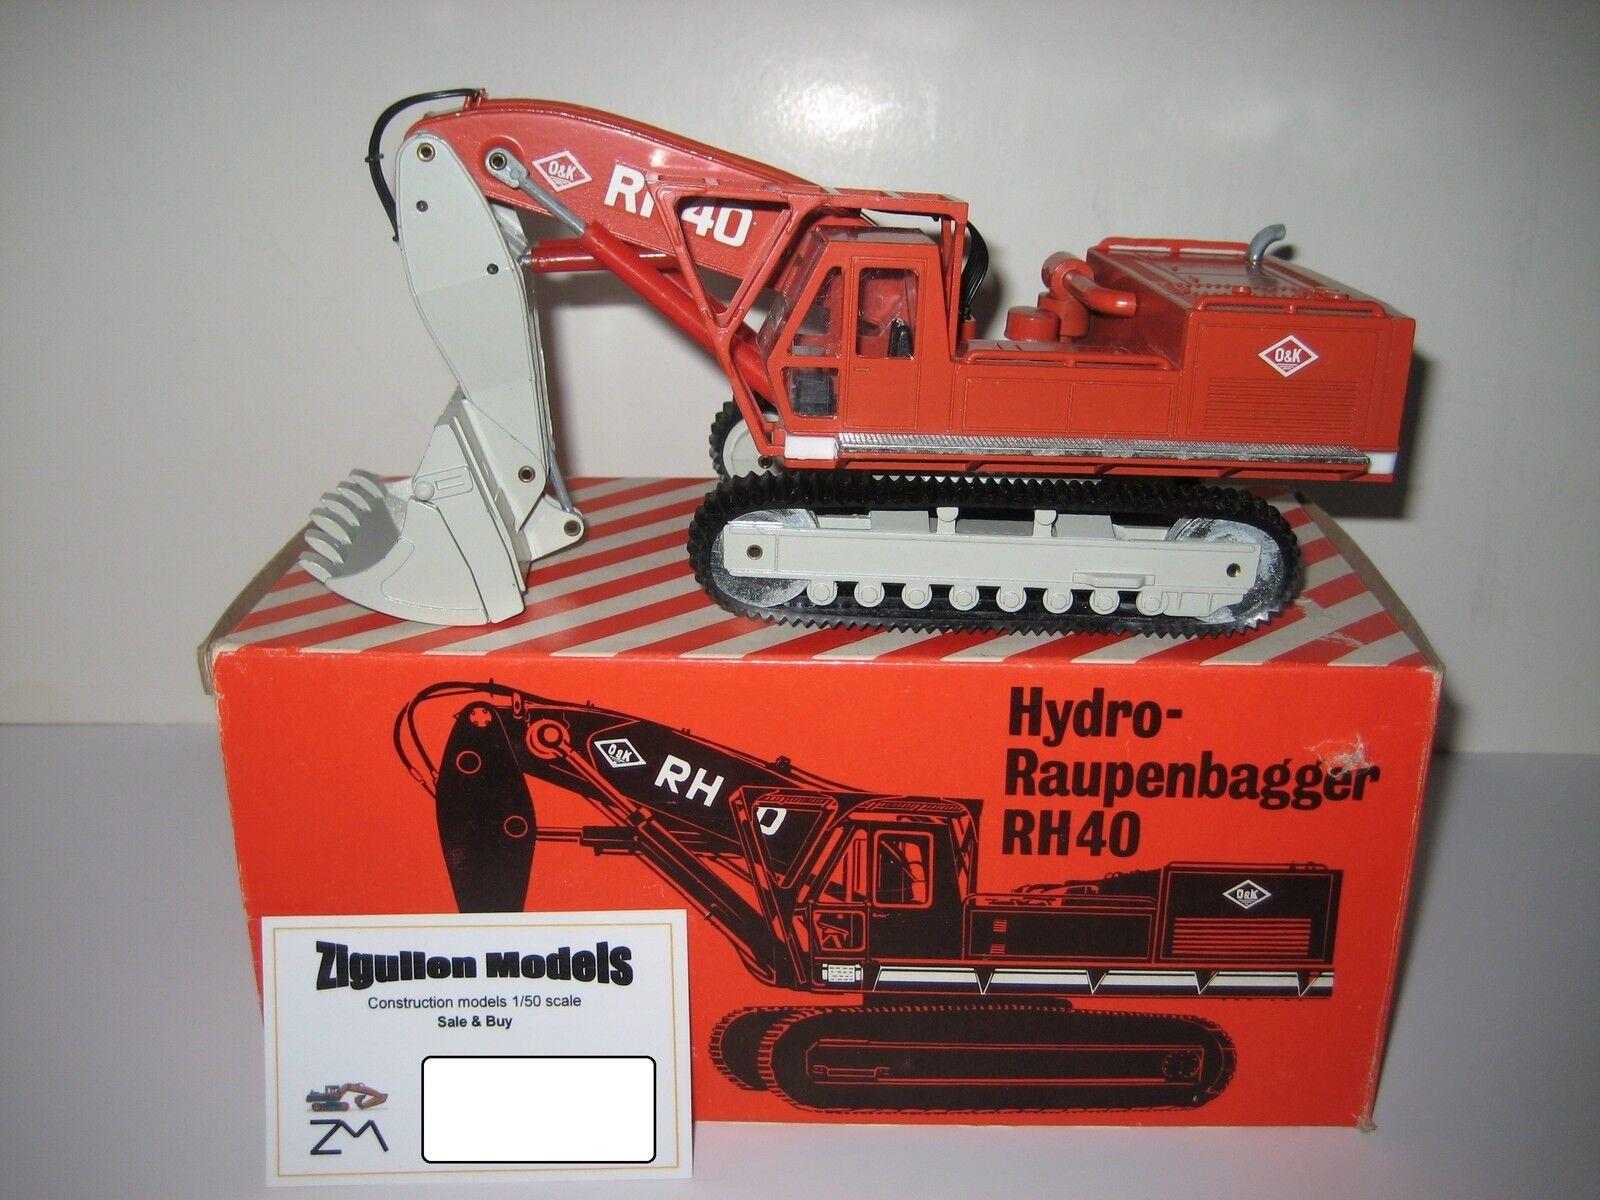 O&k Rh 40 Excavator Shovel Track Excavators Nzg 1 50 Boxed